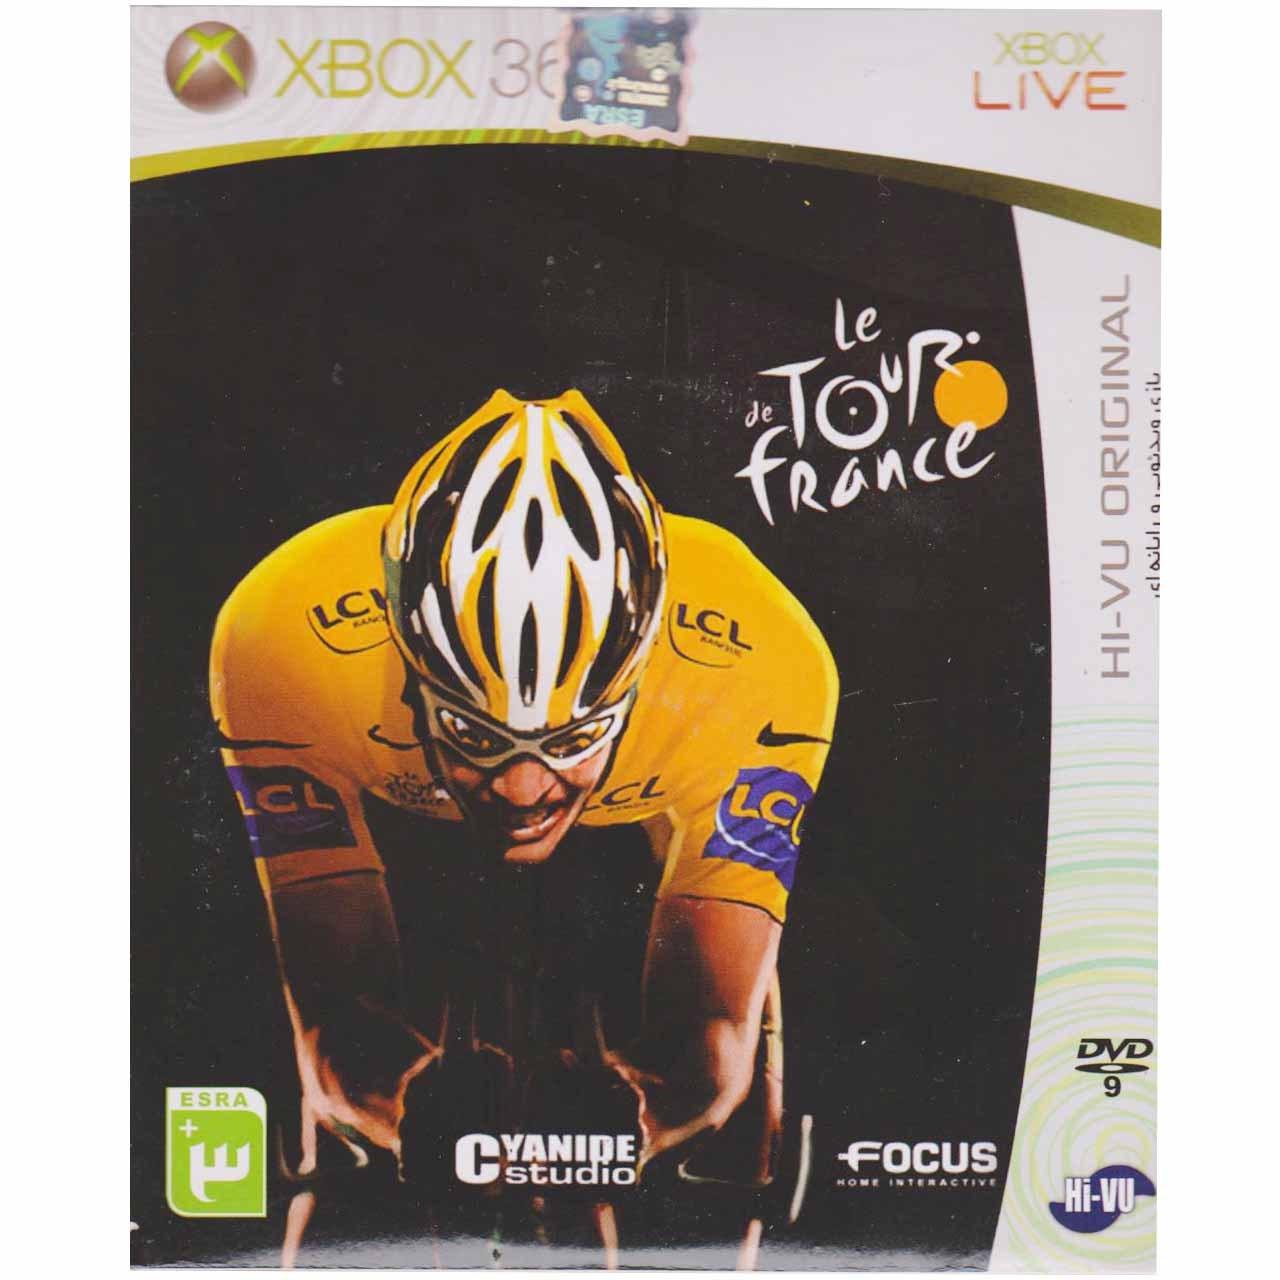 بازیِ de Tour France مخصوص ایکس باکس 360